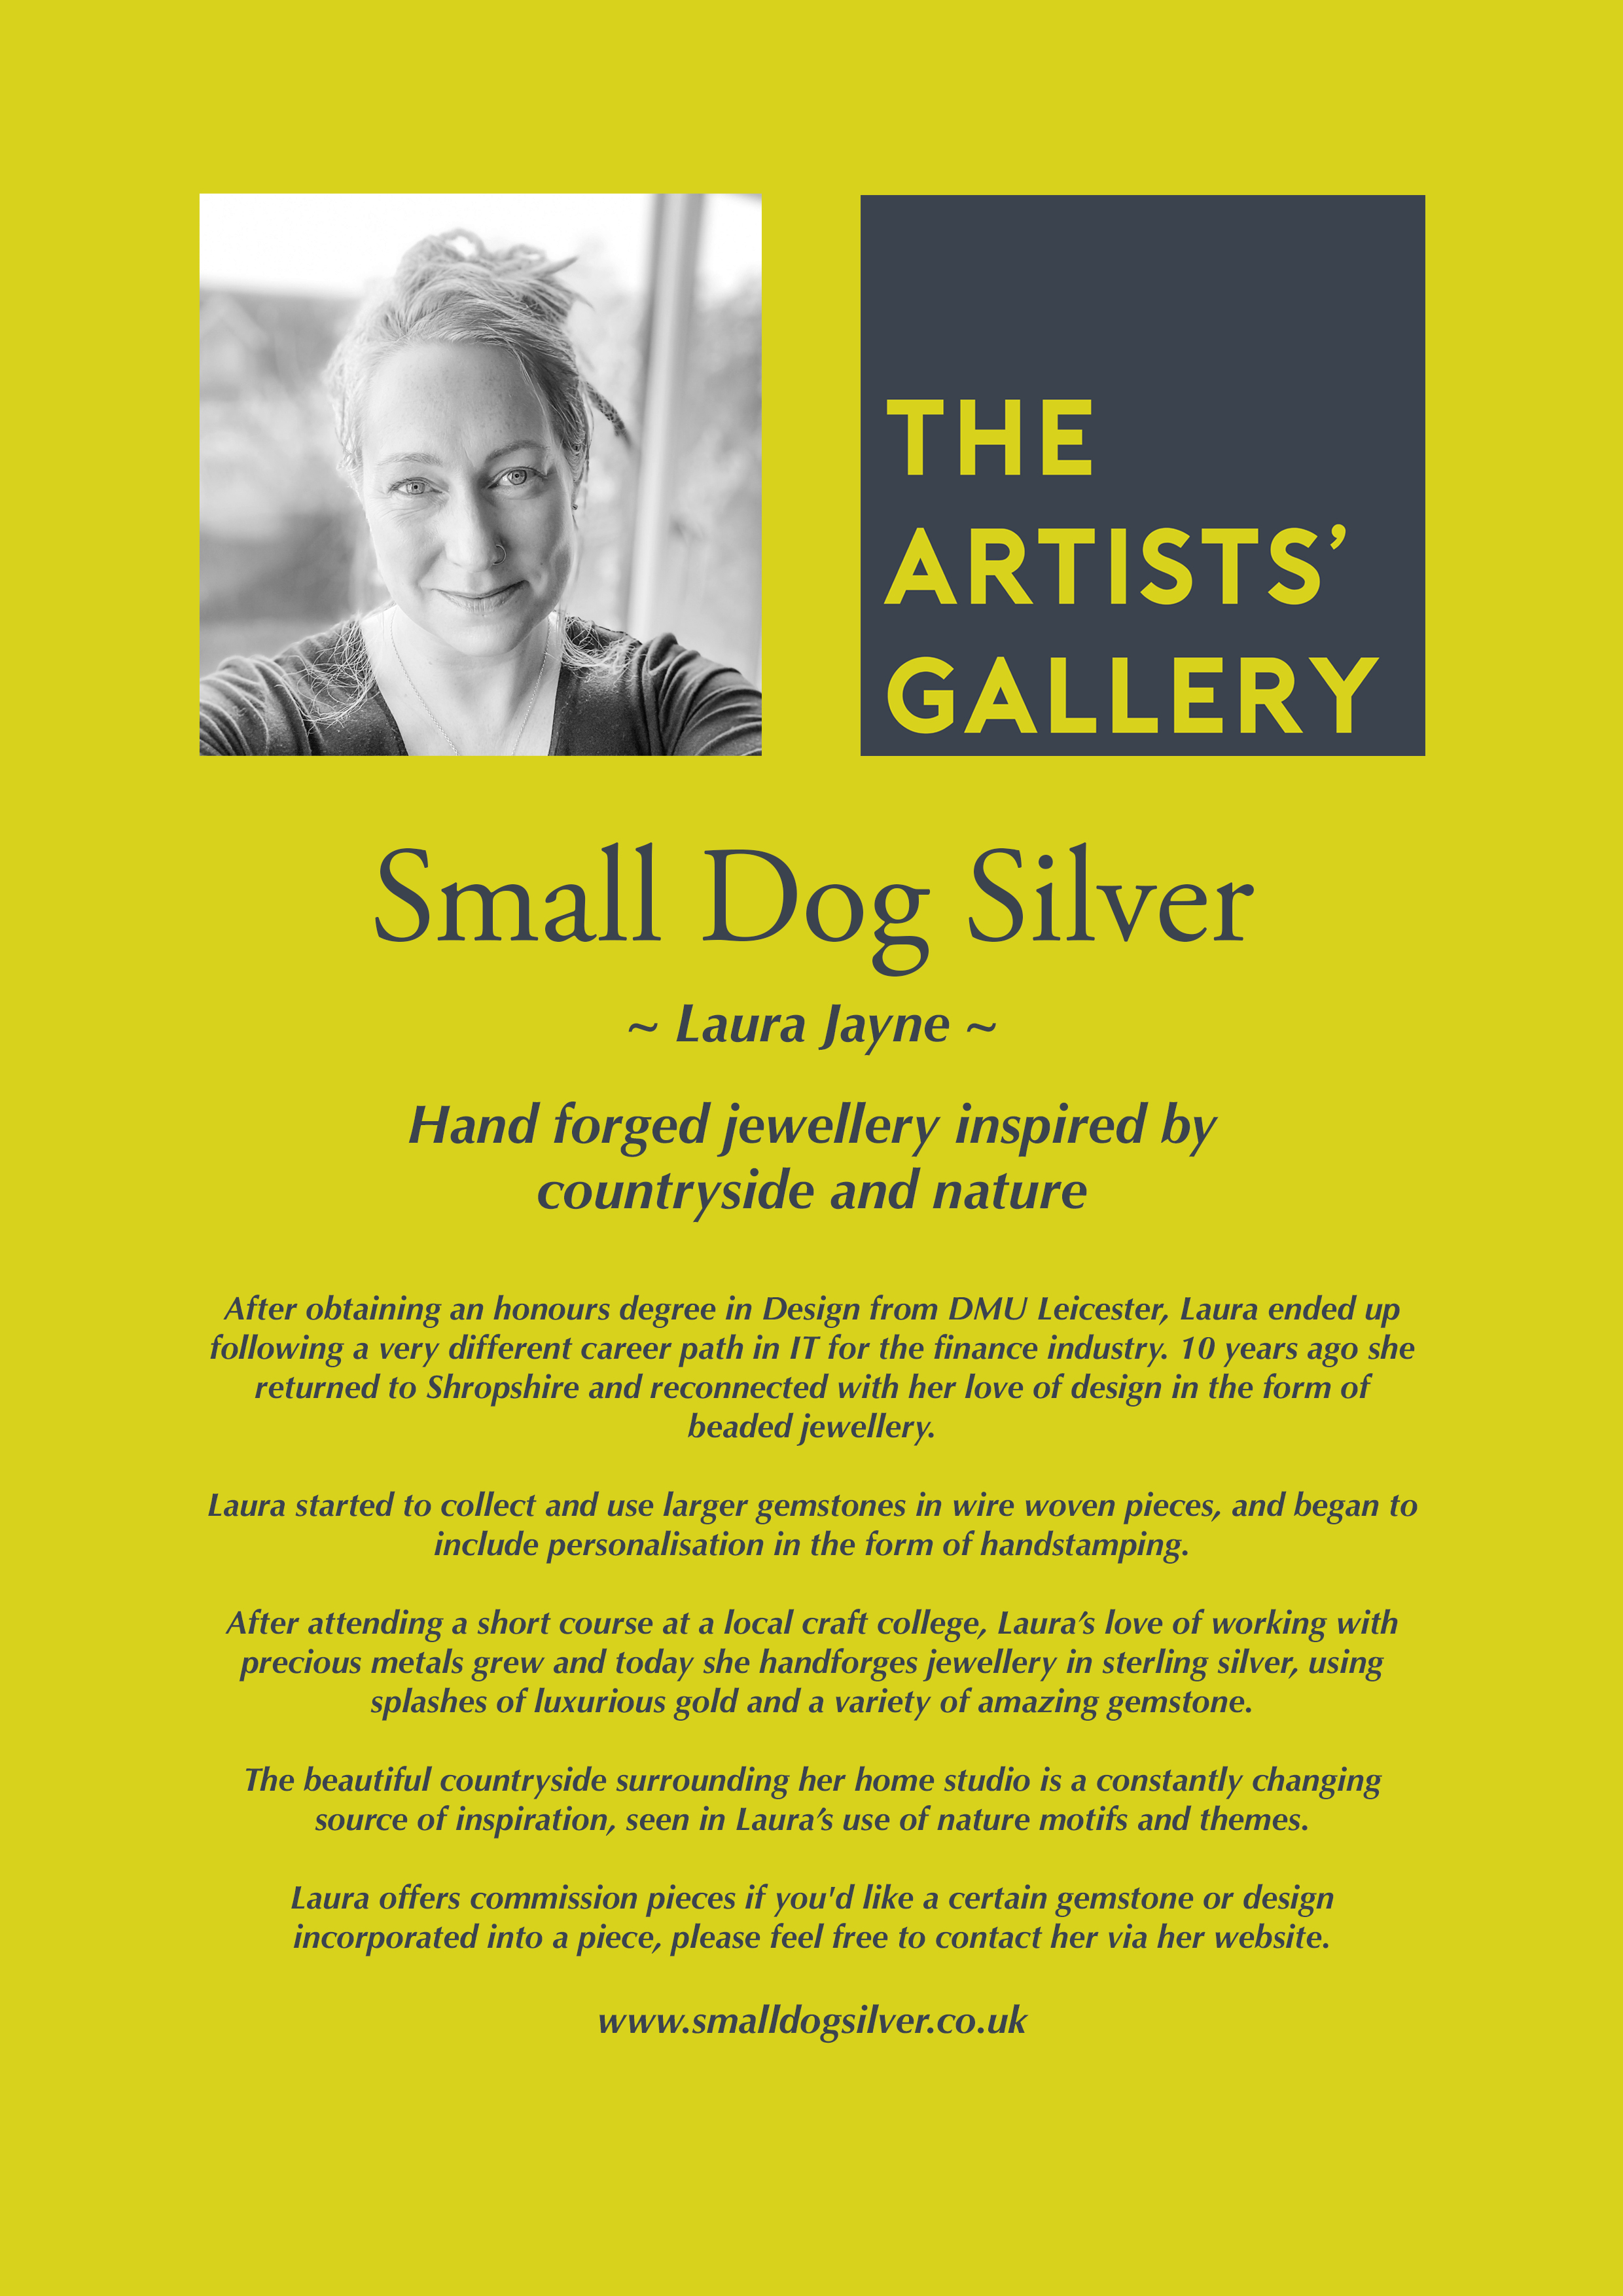 Small Dog Silver